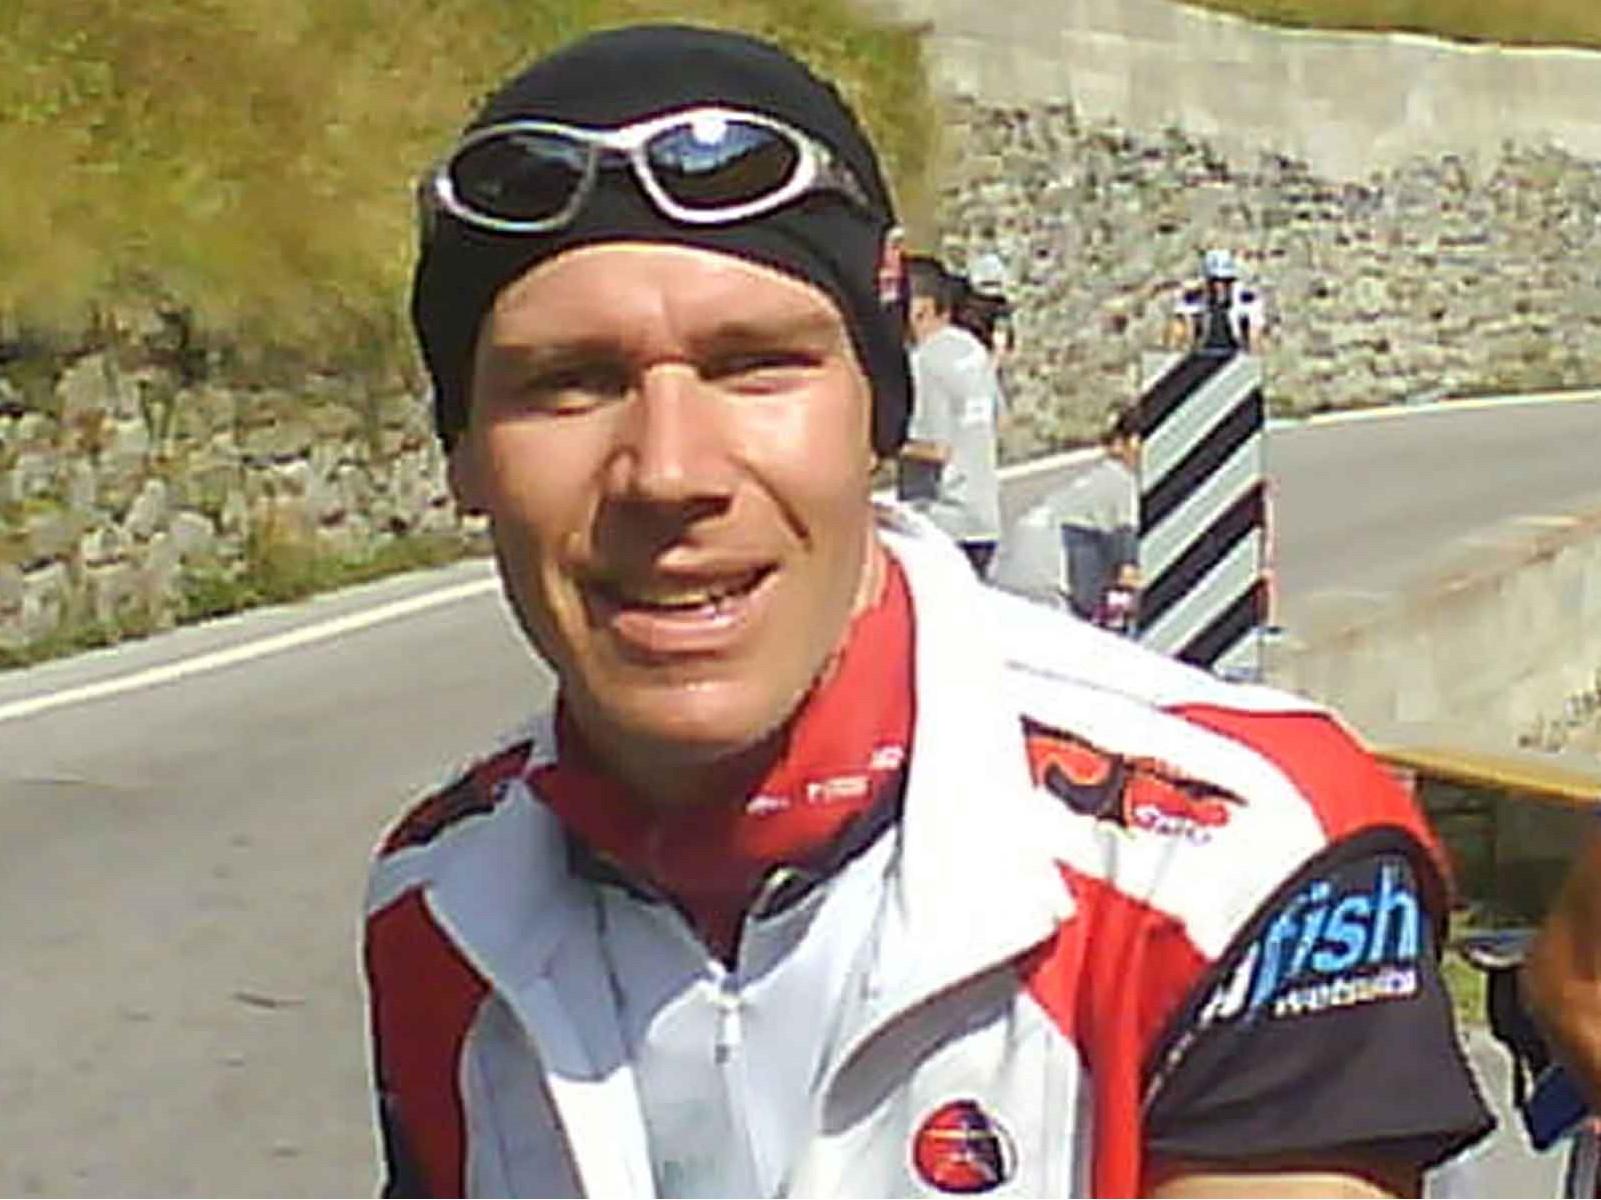 Ralf Preissl